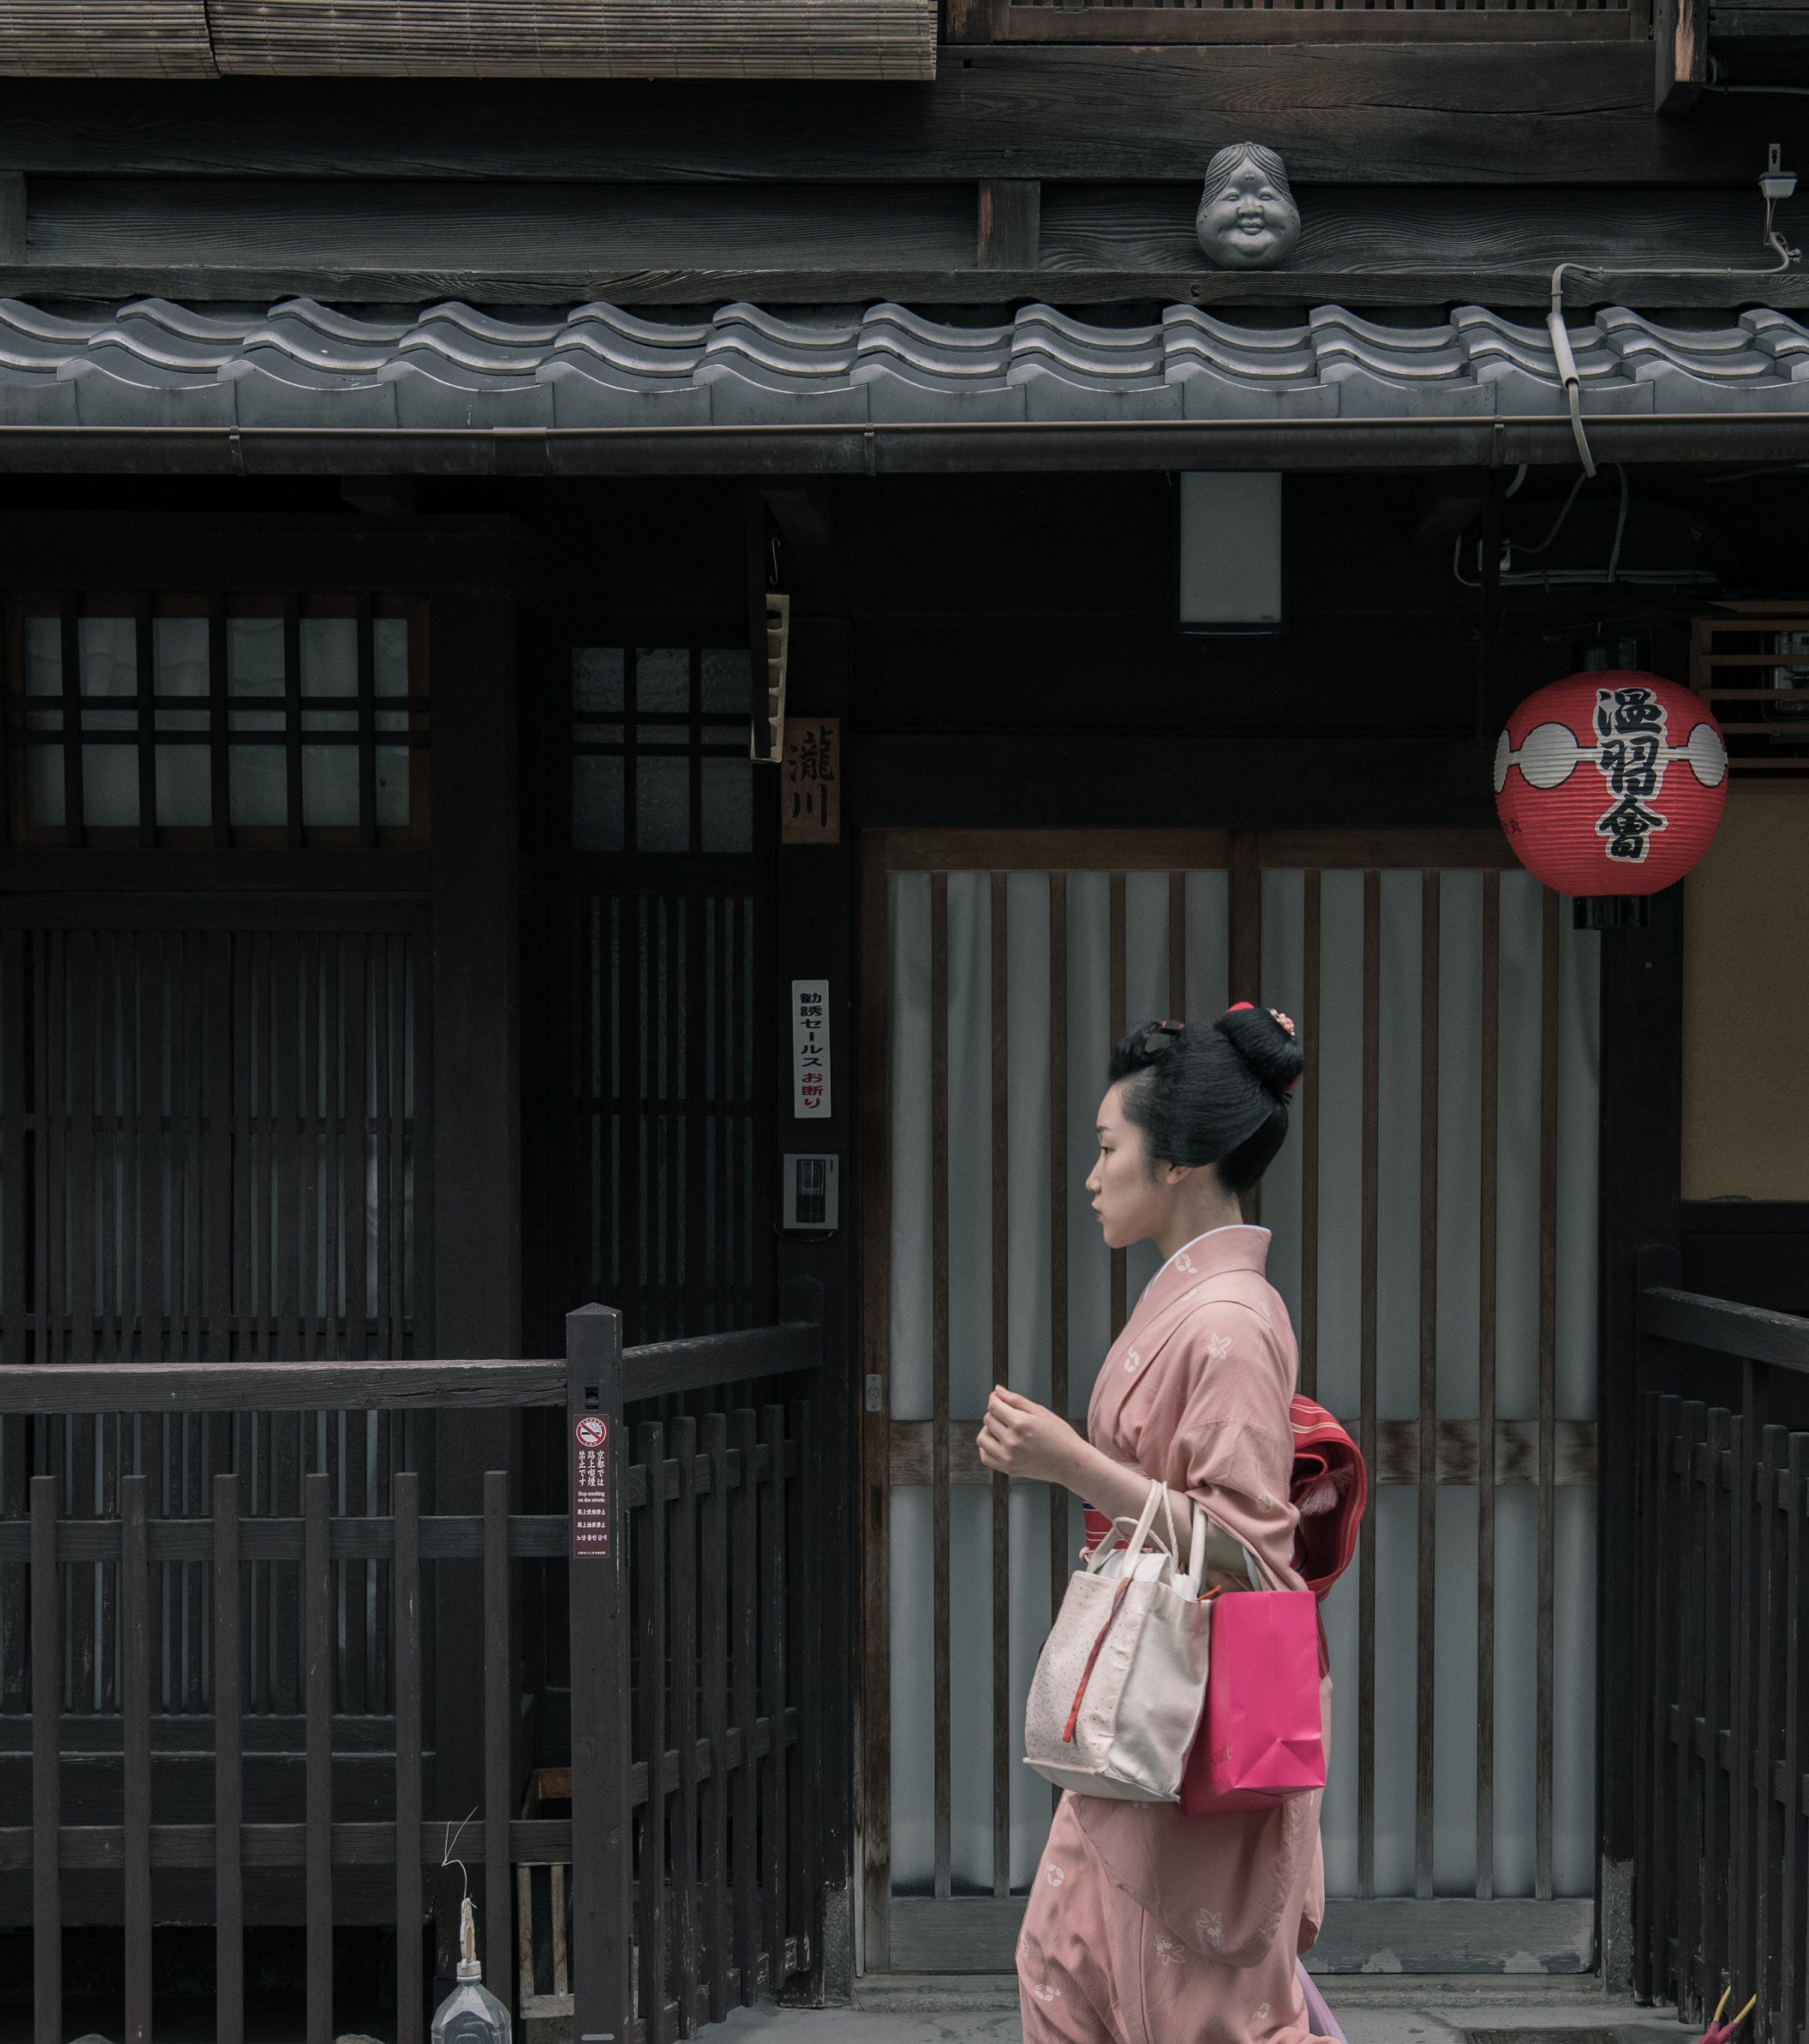 Woman Wearing Pink Kimono Walking Near Houses